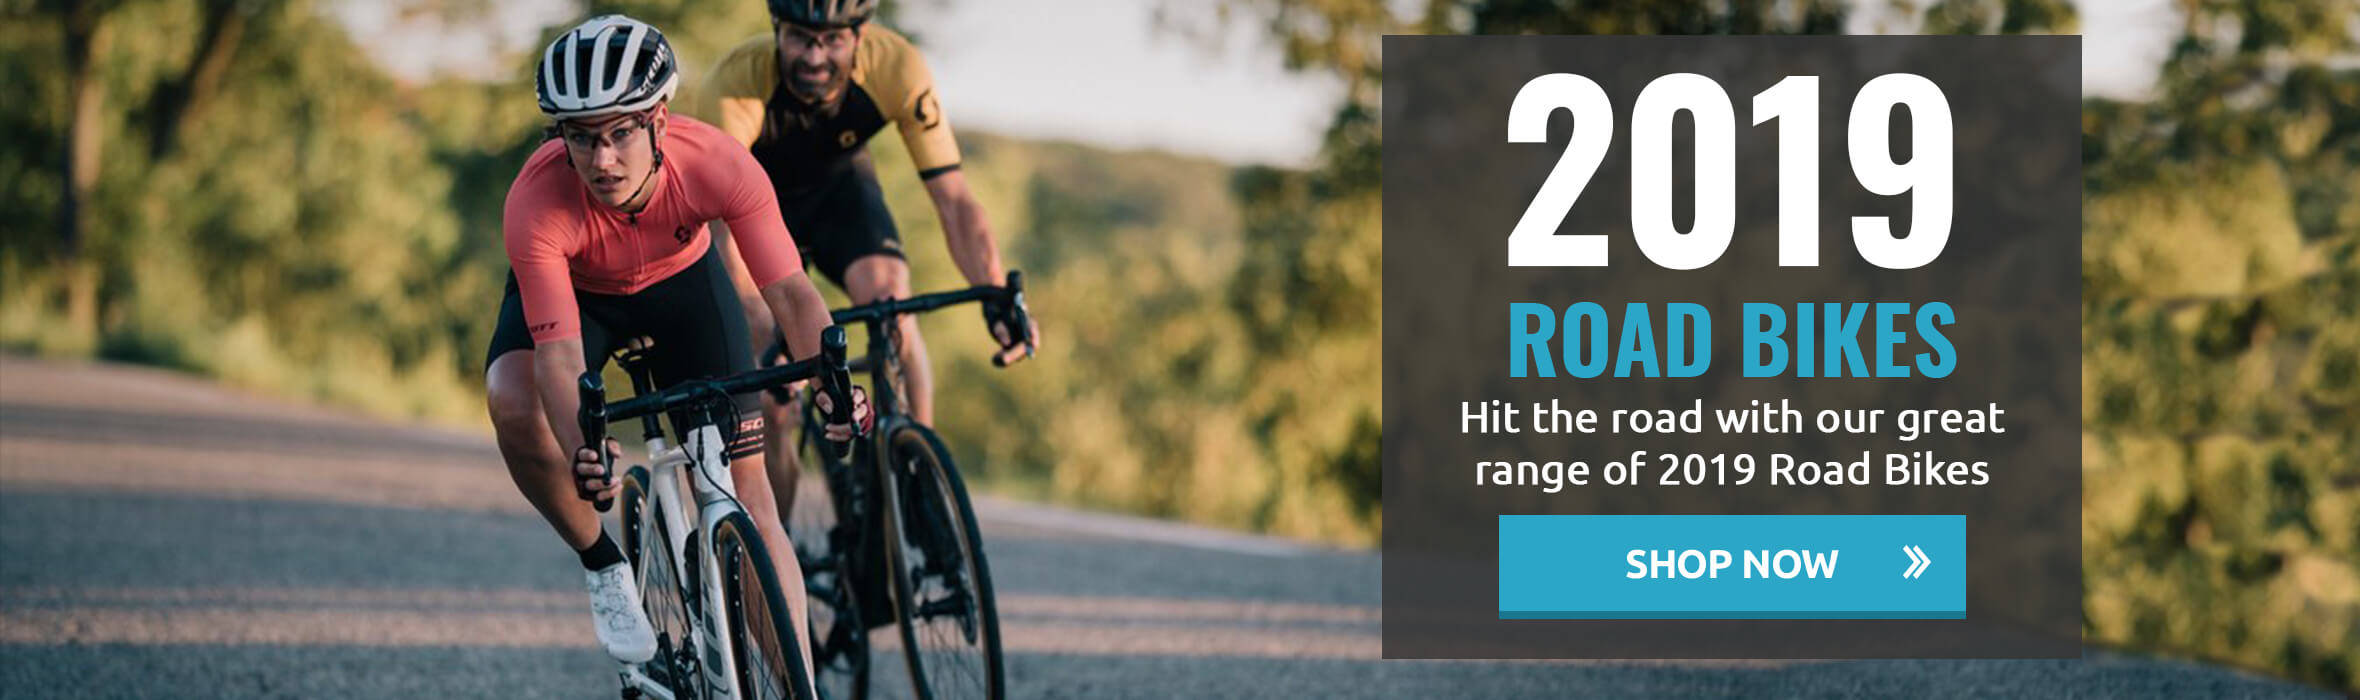 2019 Road Bikes